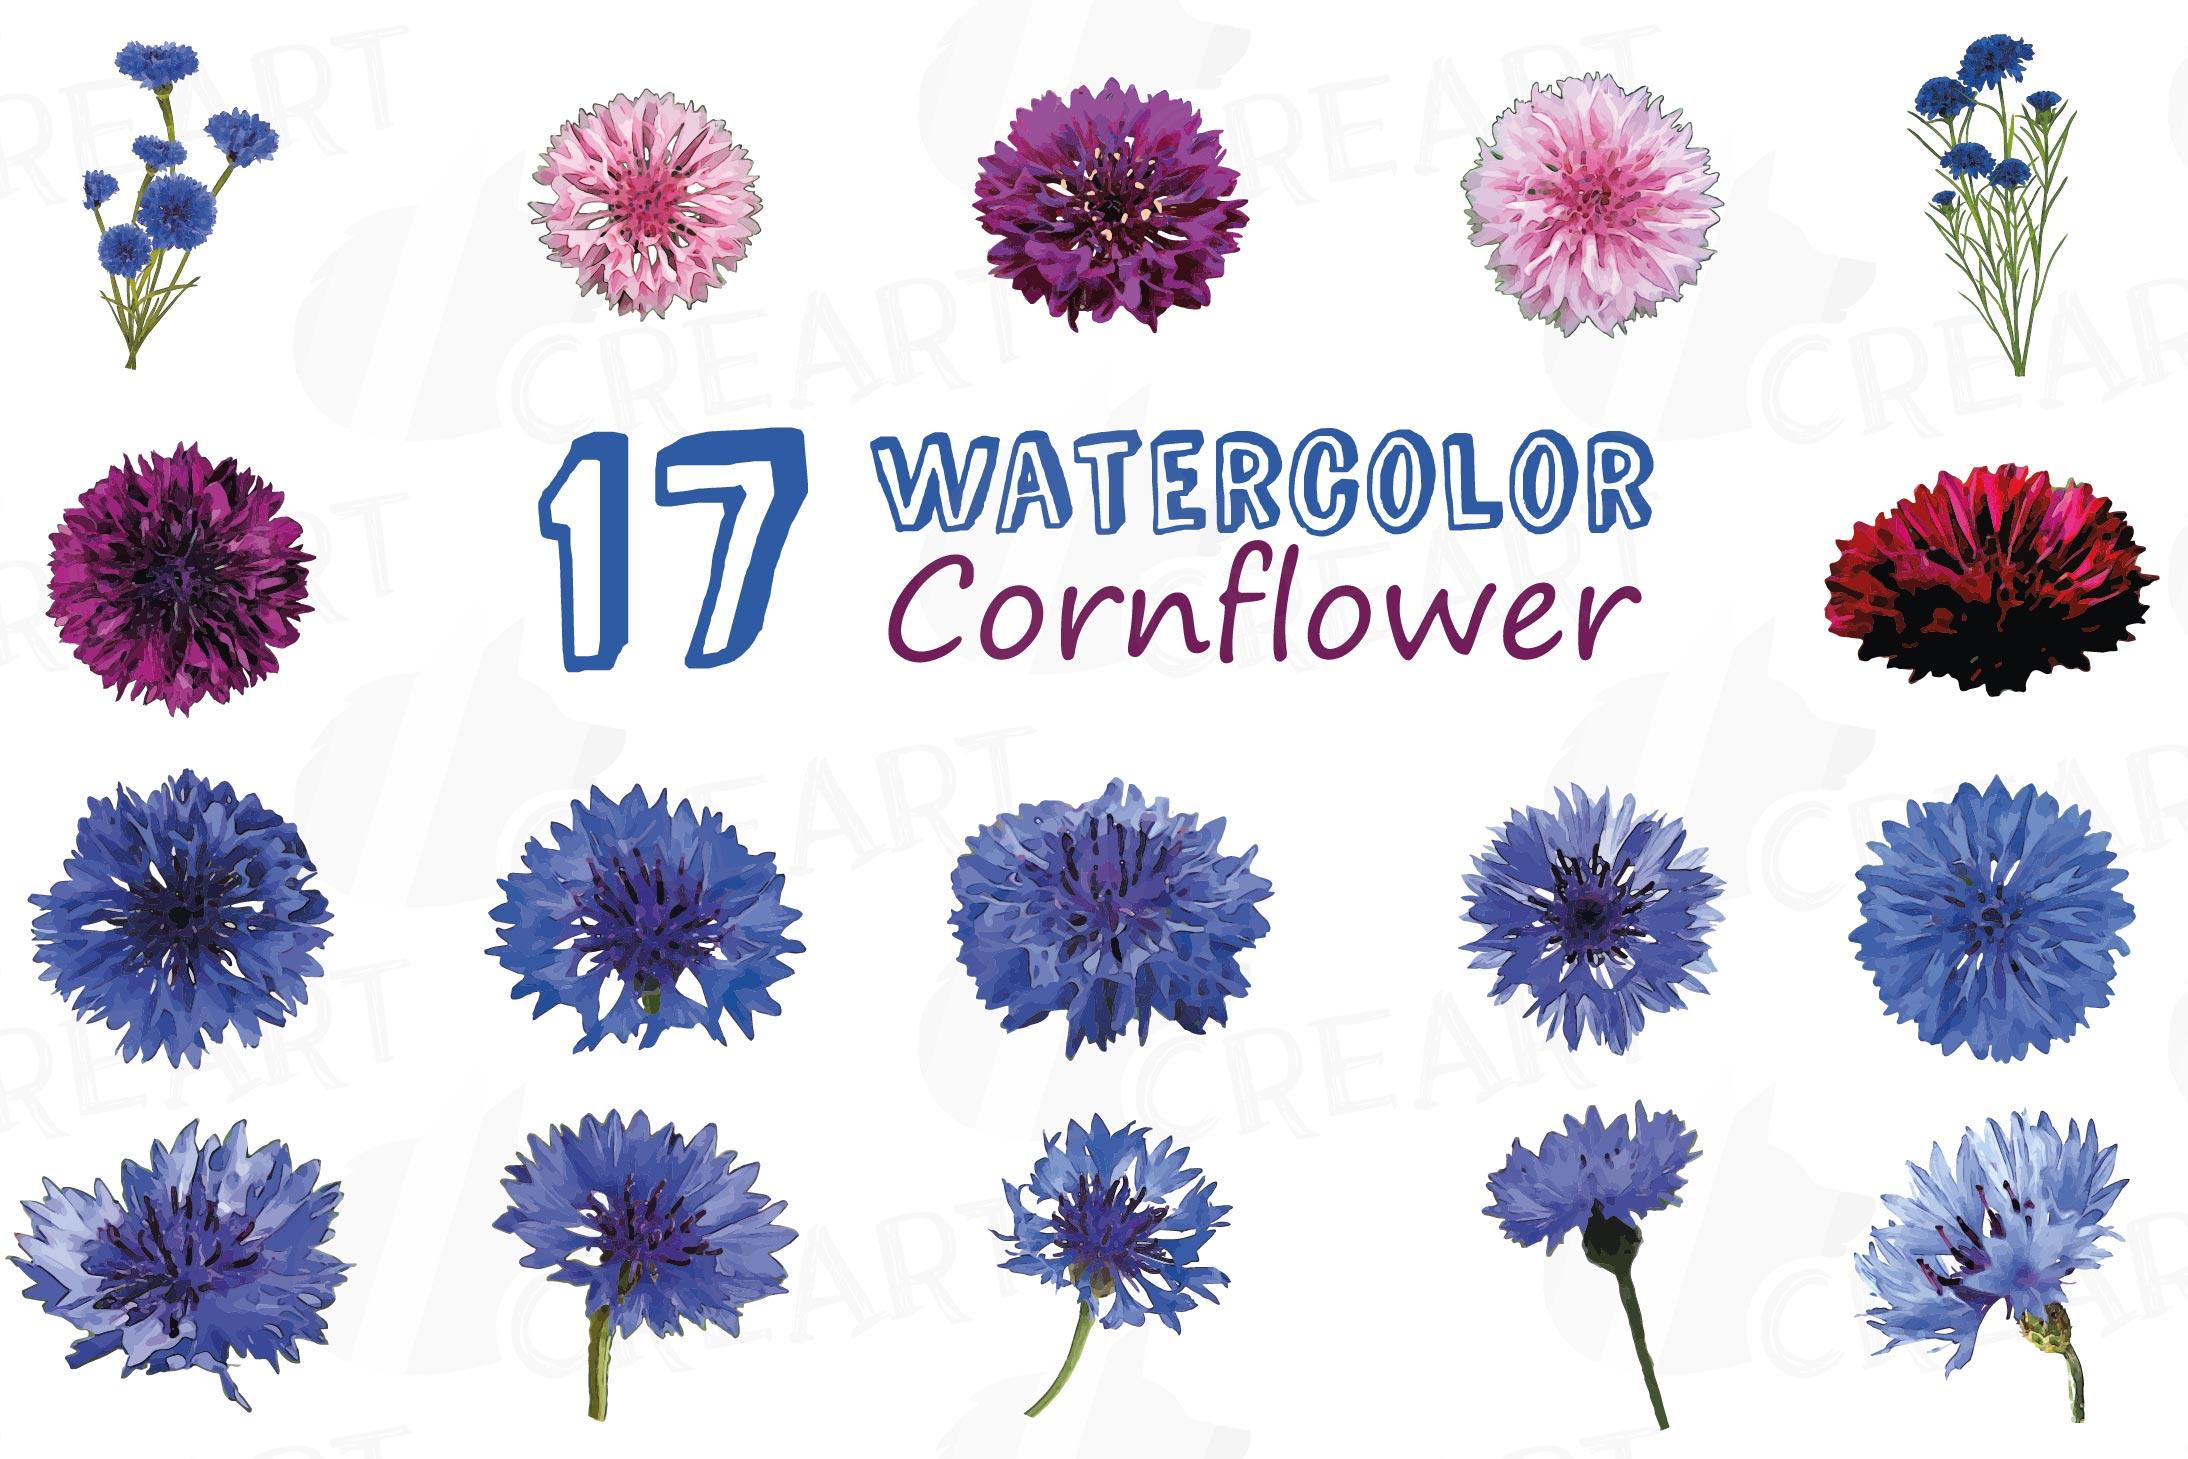 Cornflower watercolor clip art pack, bachelor's button example image 3